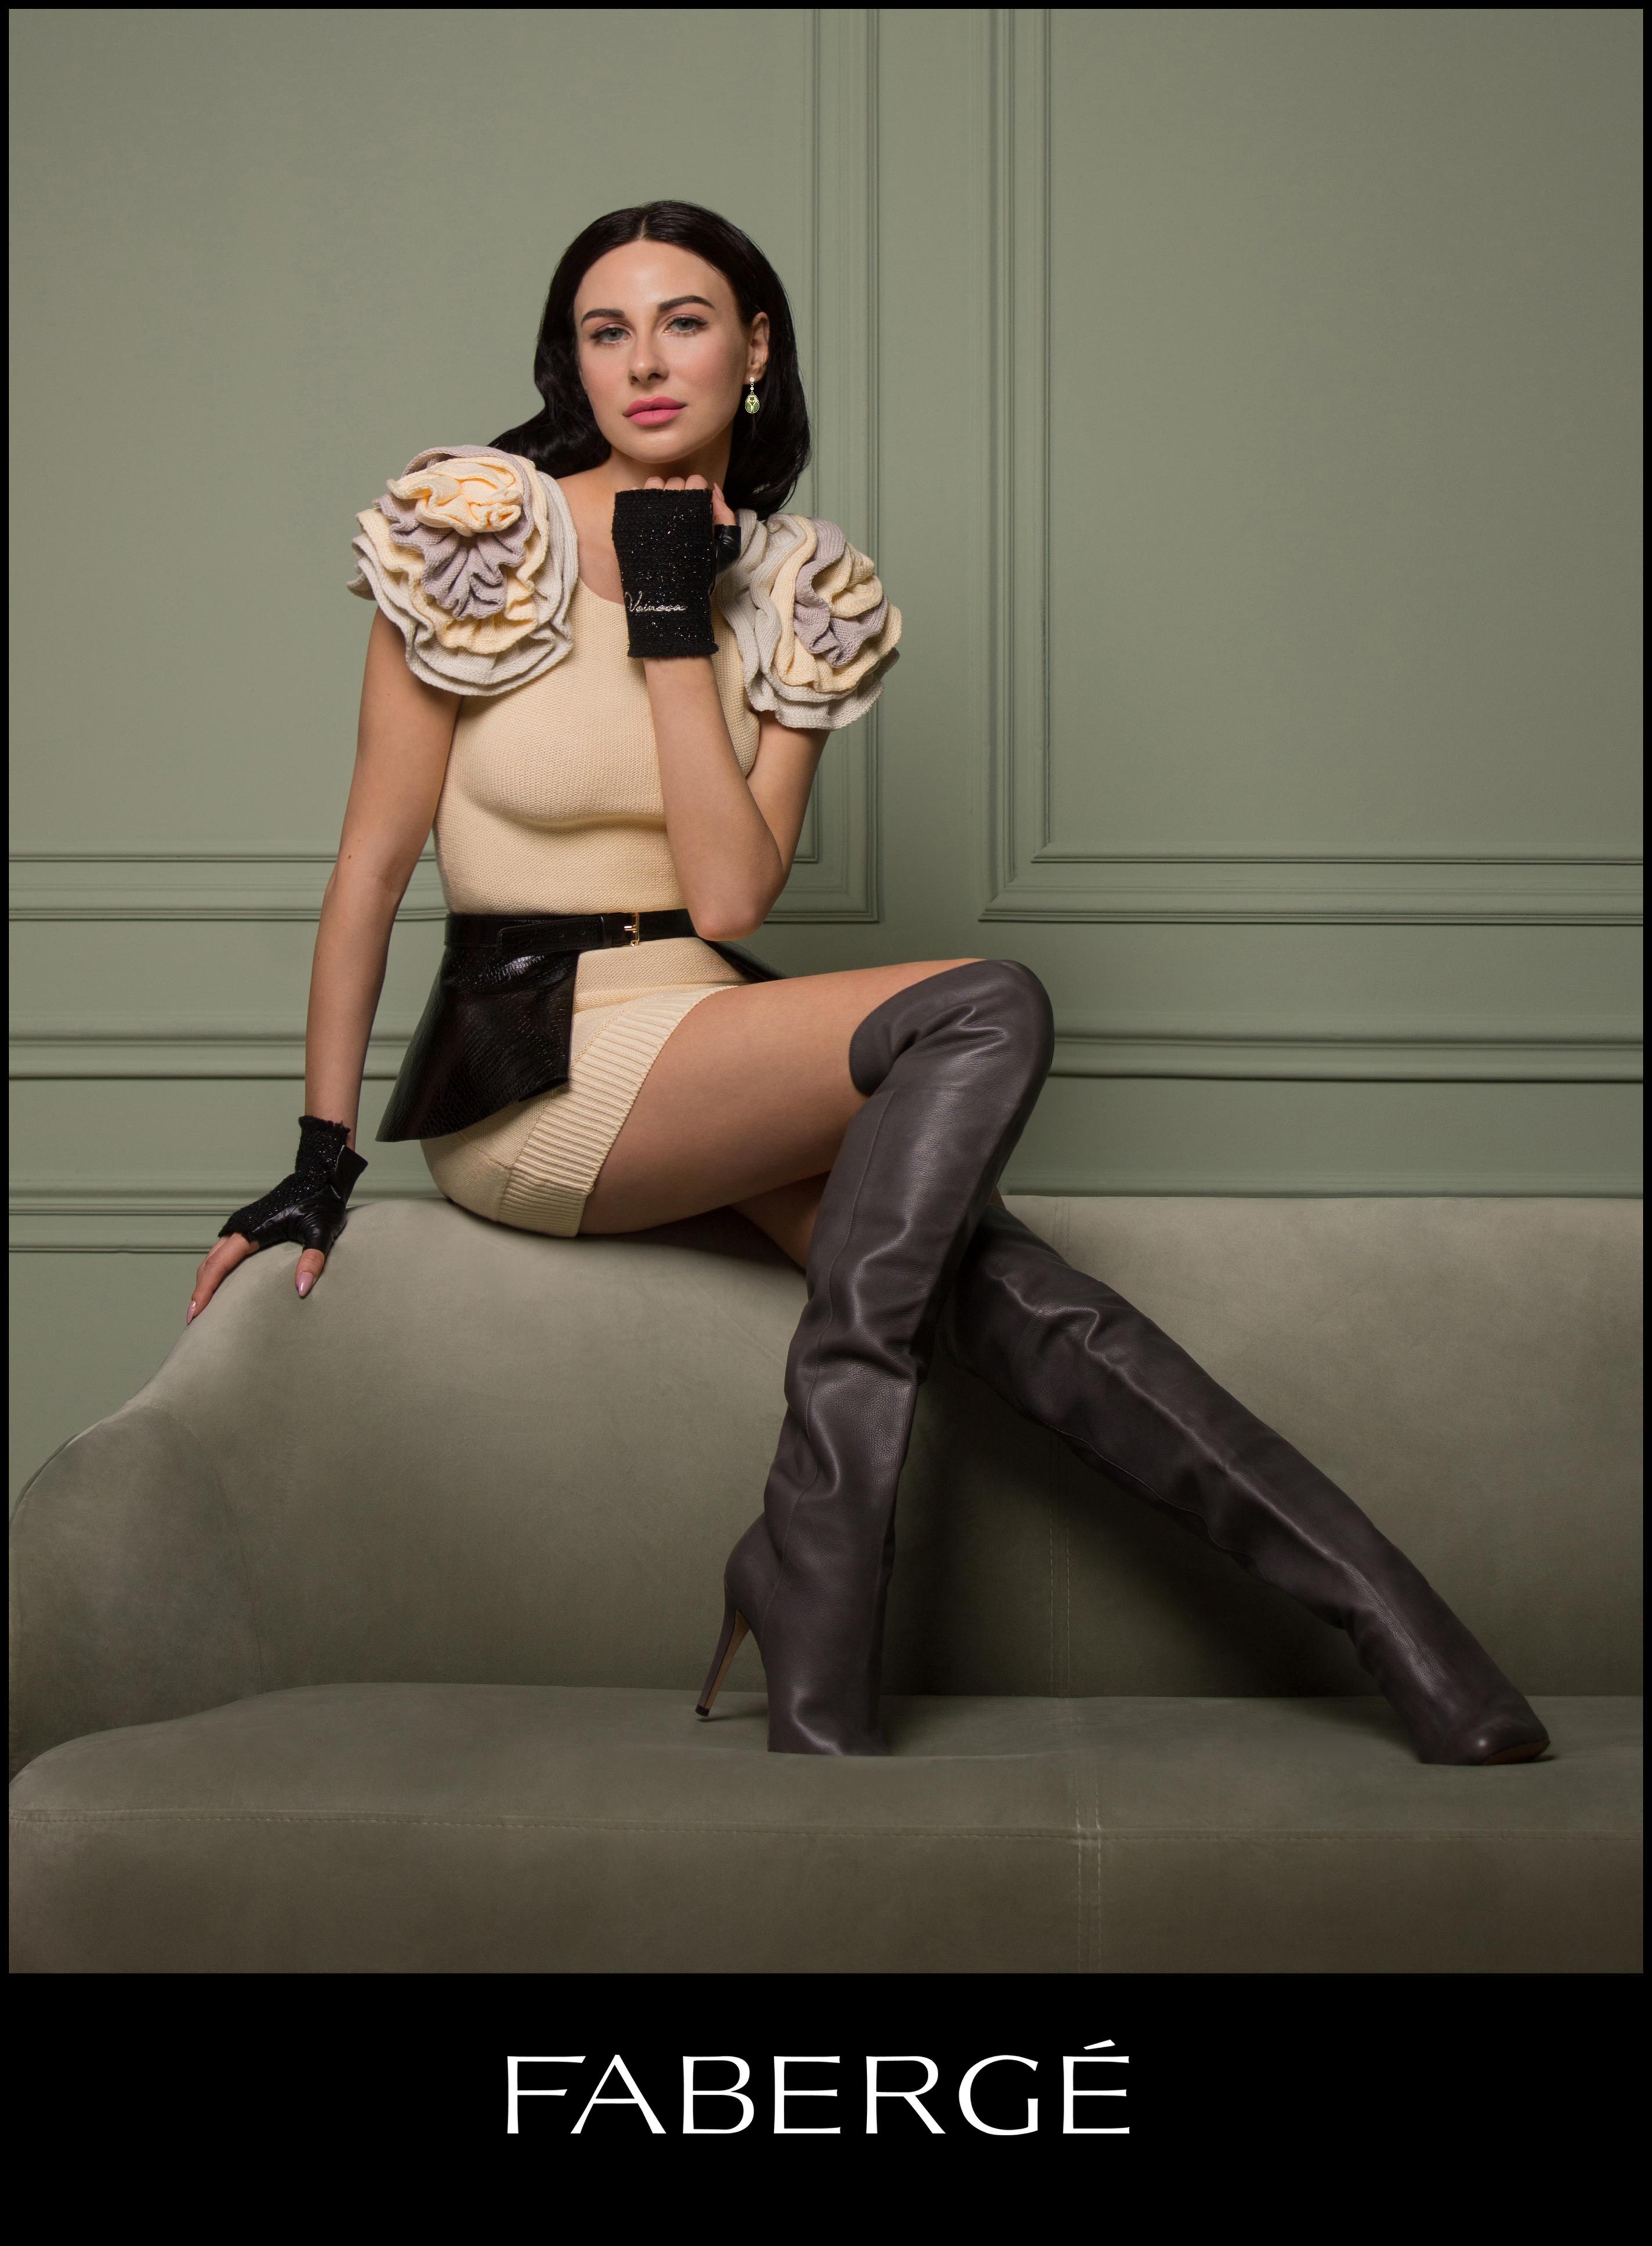 Mariana Voinova Faberge campaign